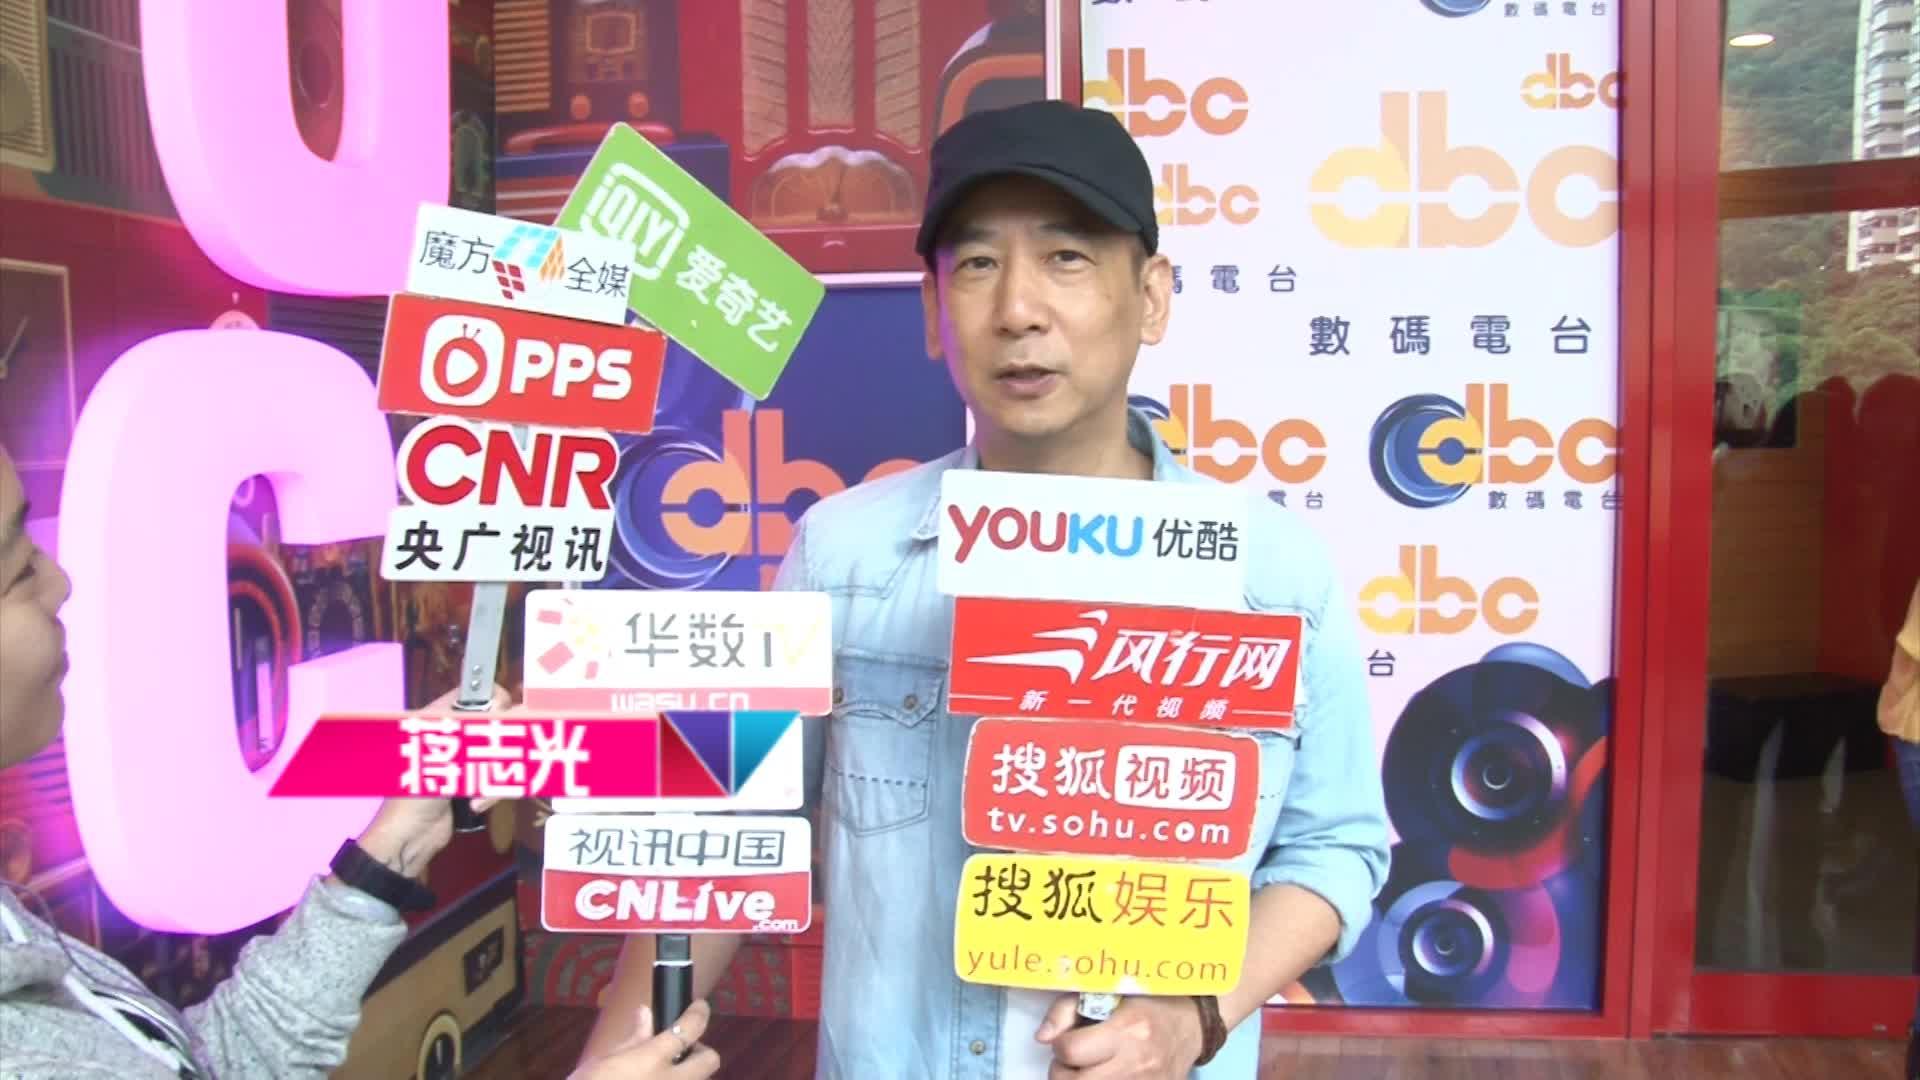 TVB艺人蒋志光一曲爆红 平静对待人气急升